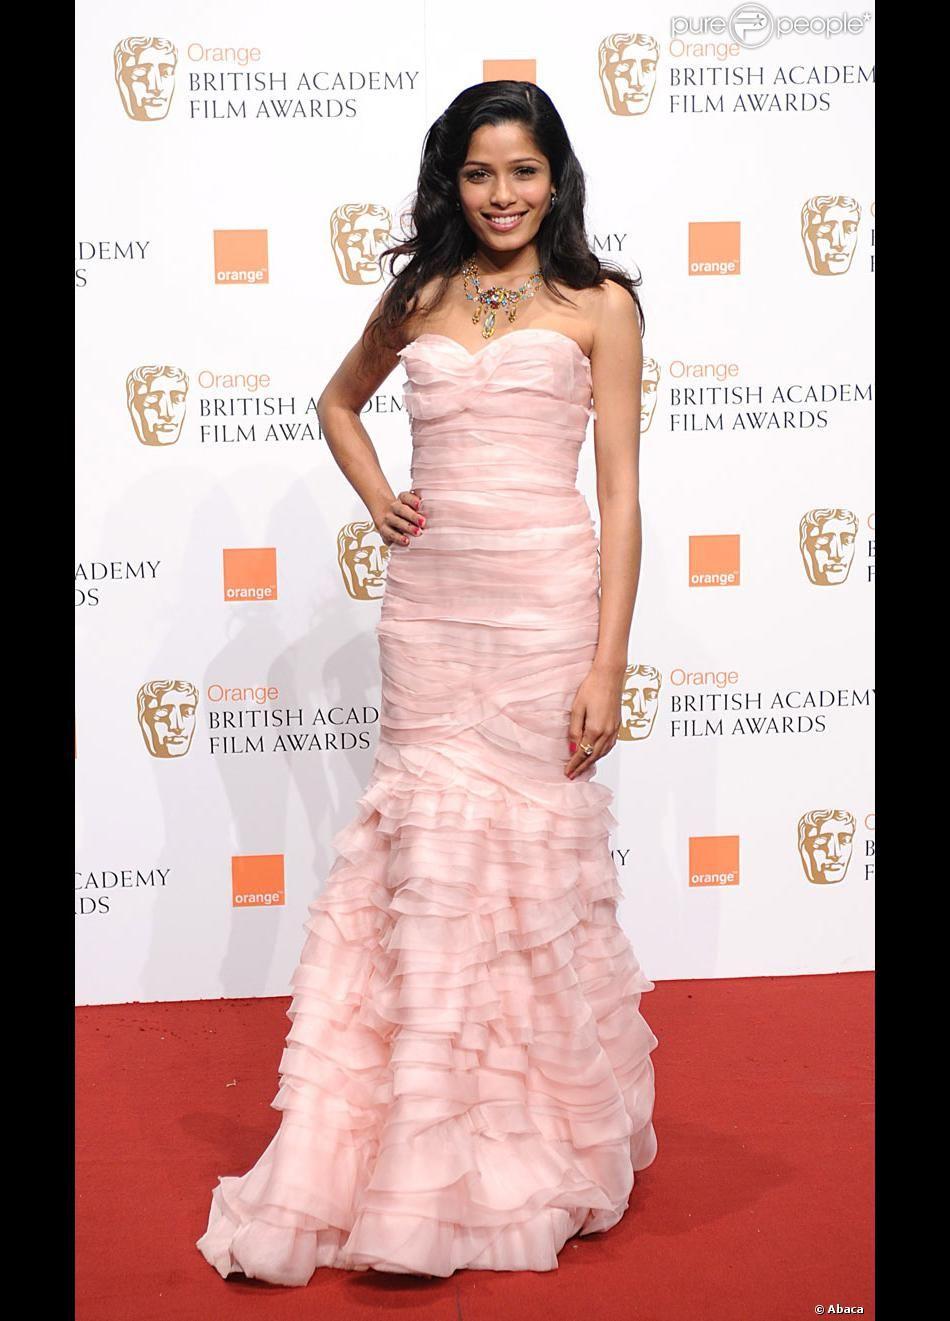 PHOTOS - Aux BAFTA, Freida Pinto est exquise dans cette robe rose ...